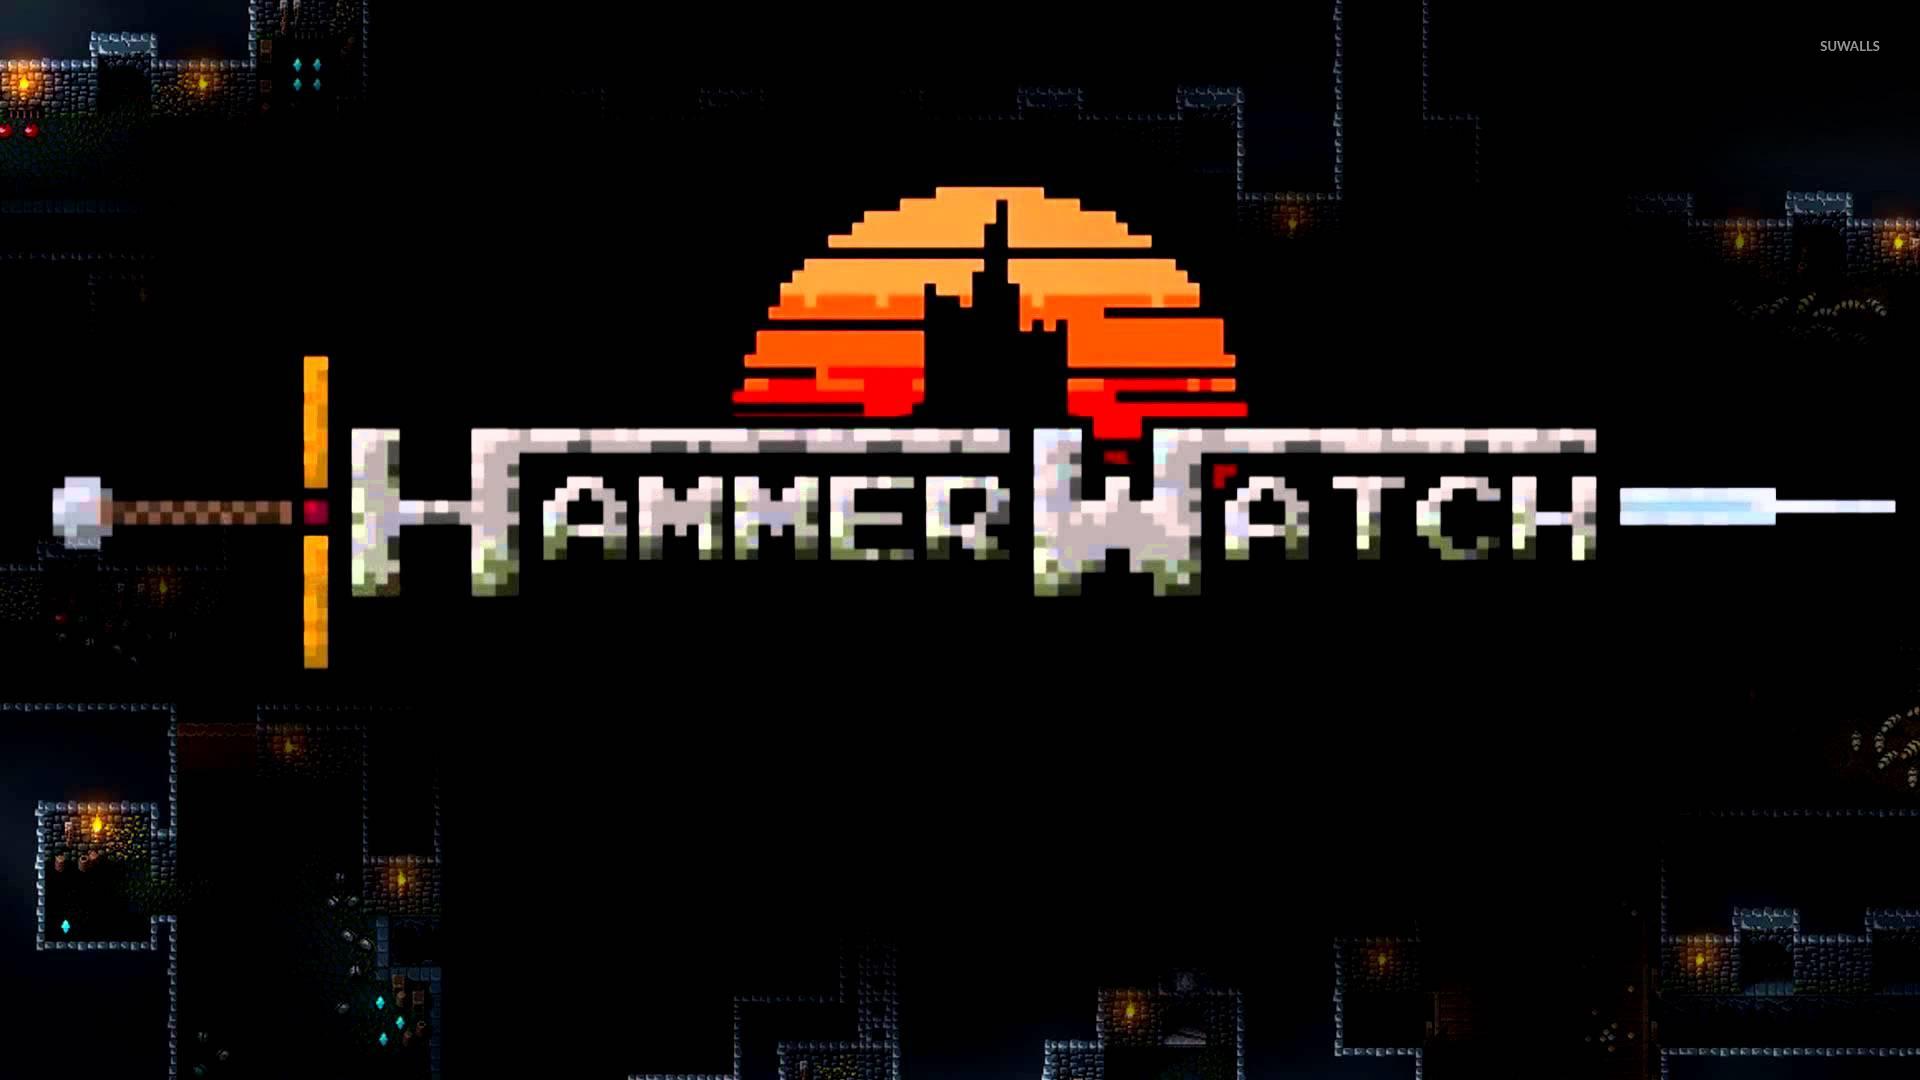 Hammerwatch wallpaper   Game wallpapers   22918 1920x1080